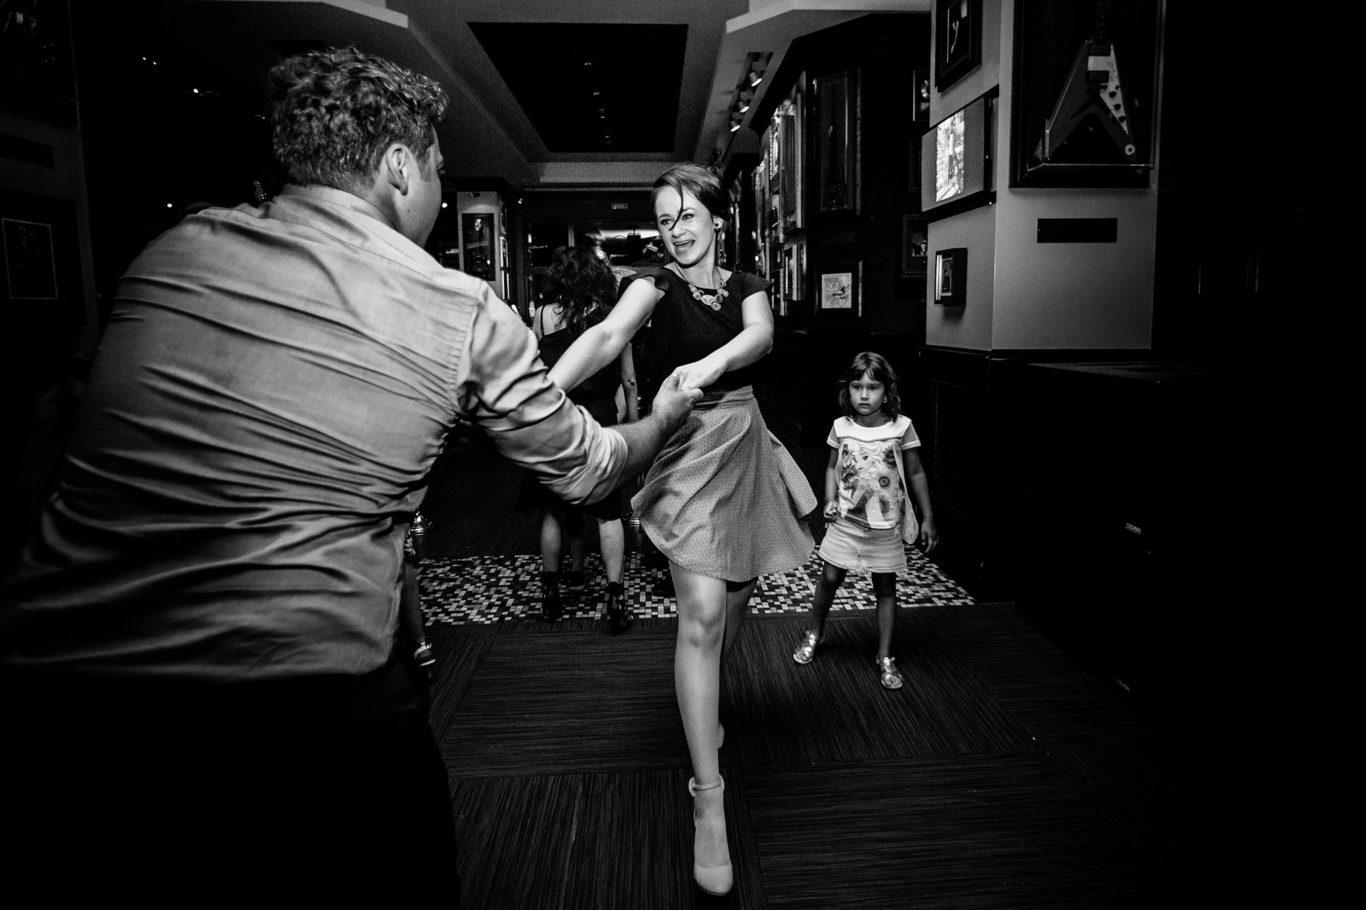 0594-fotografie-nunta-bucuresti-rodica-rares-fotograf-ciprian-dumitrescu-cd2_0317